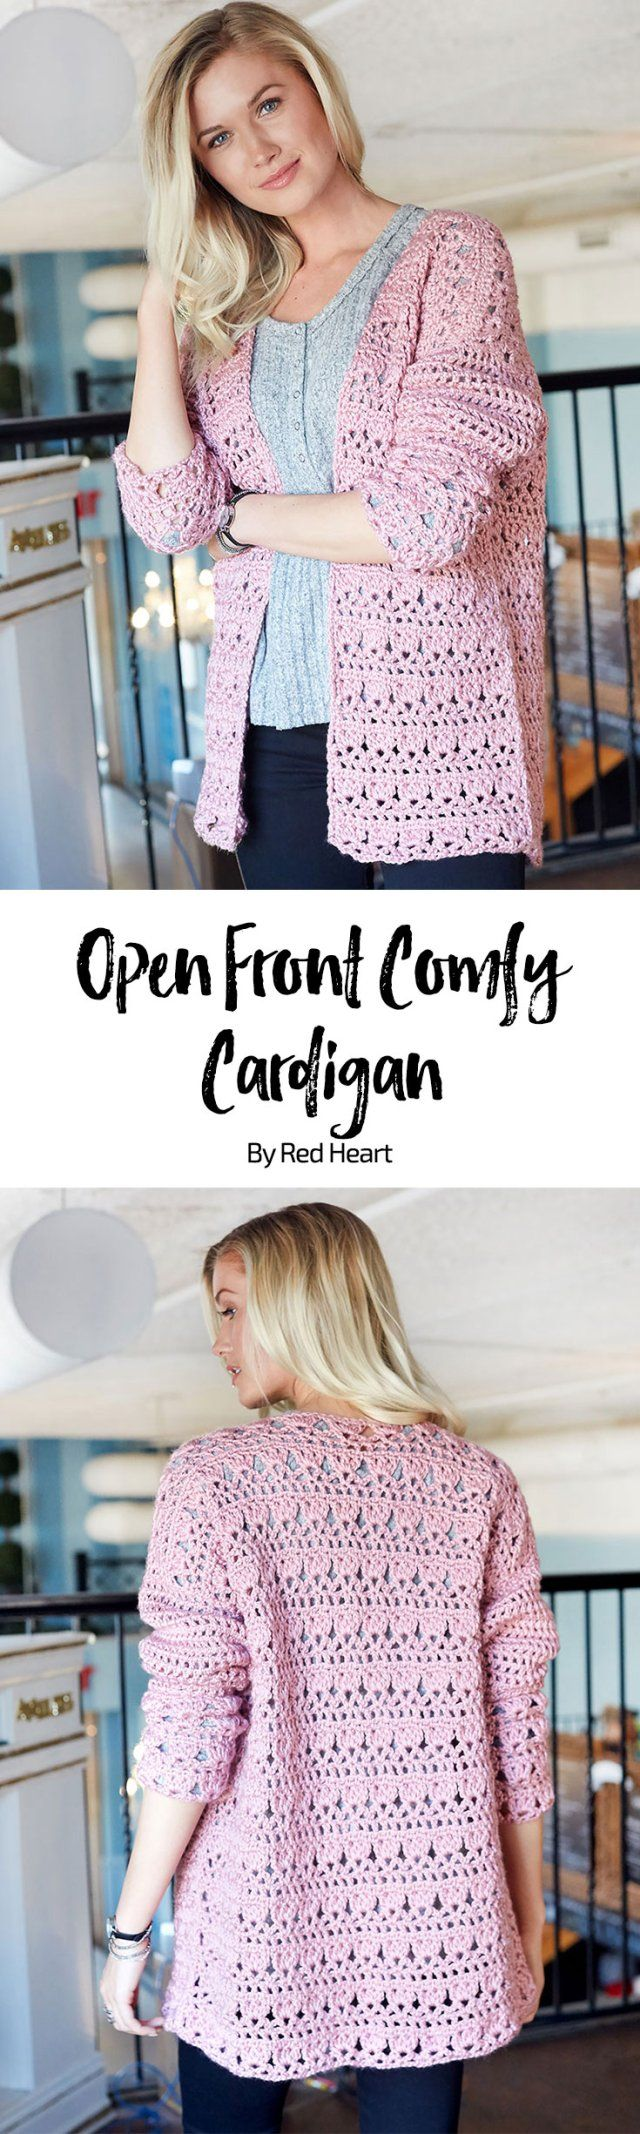 Open Front Comfy Cardigan free crochet pattern in Soft yarn.